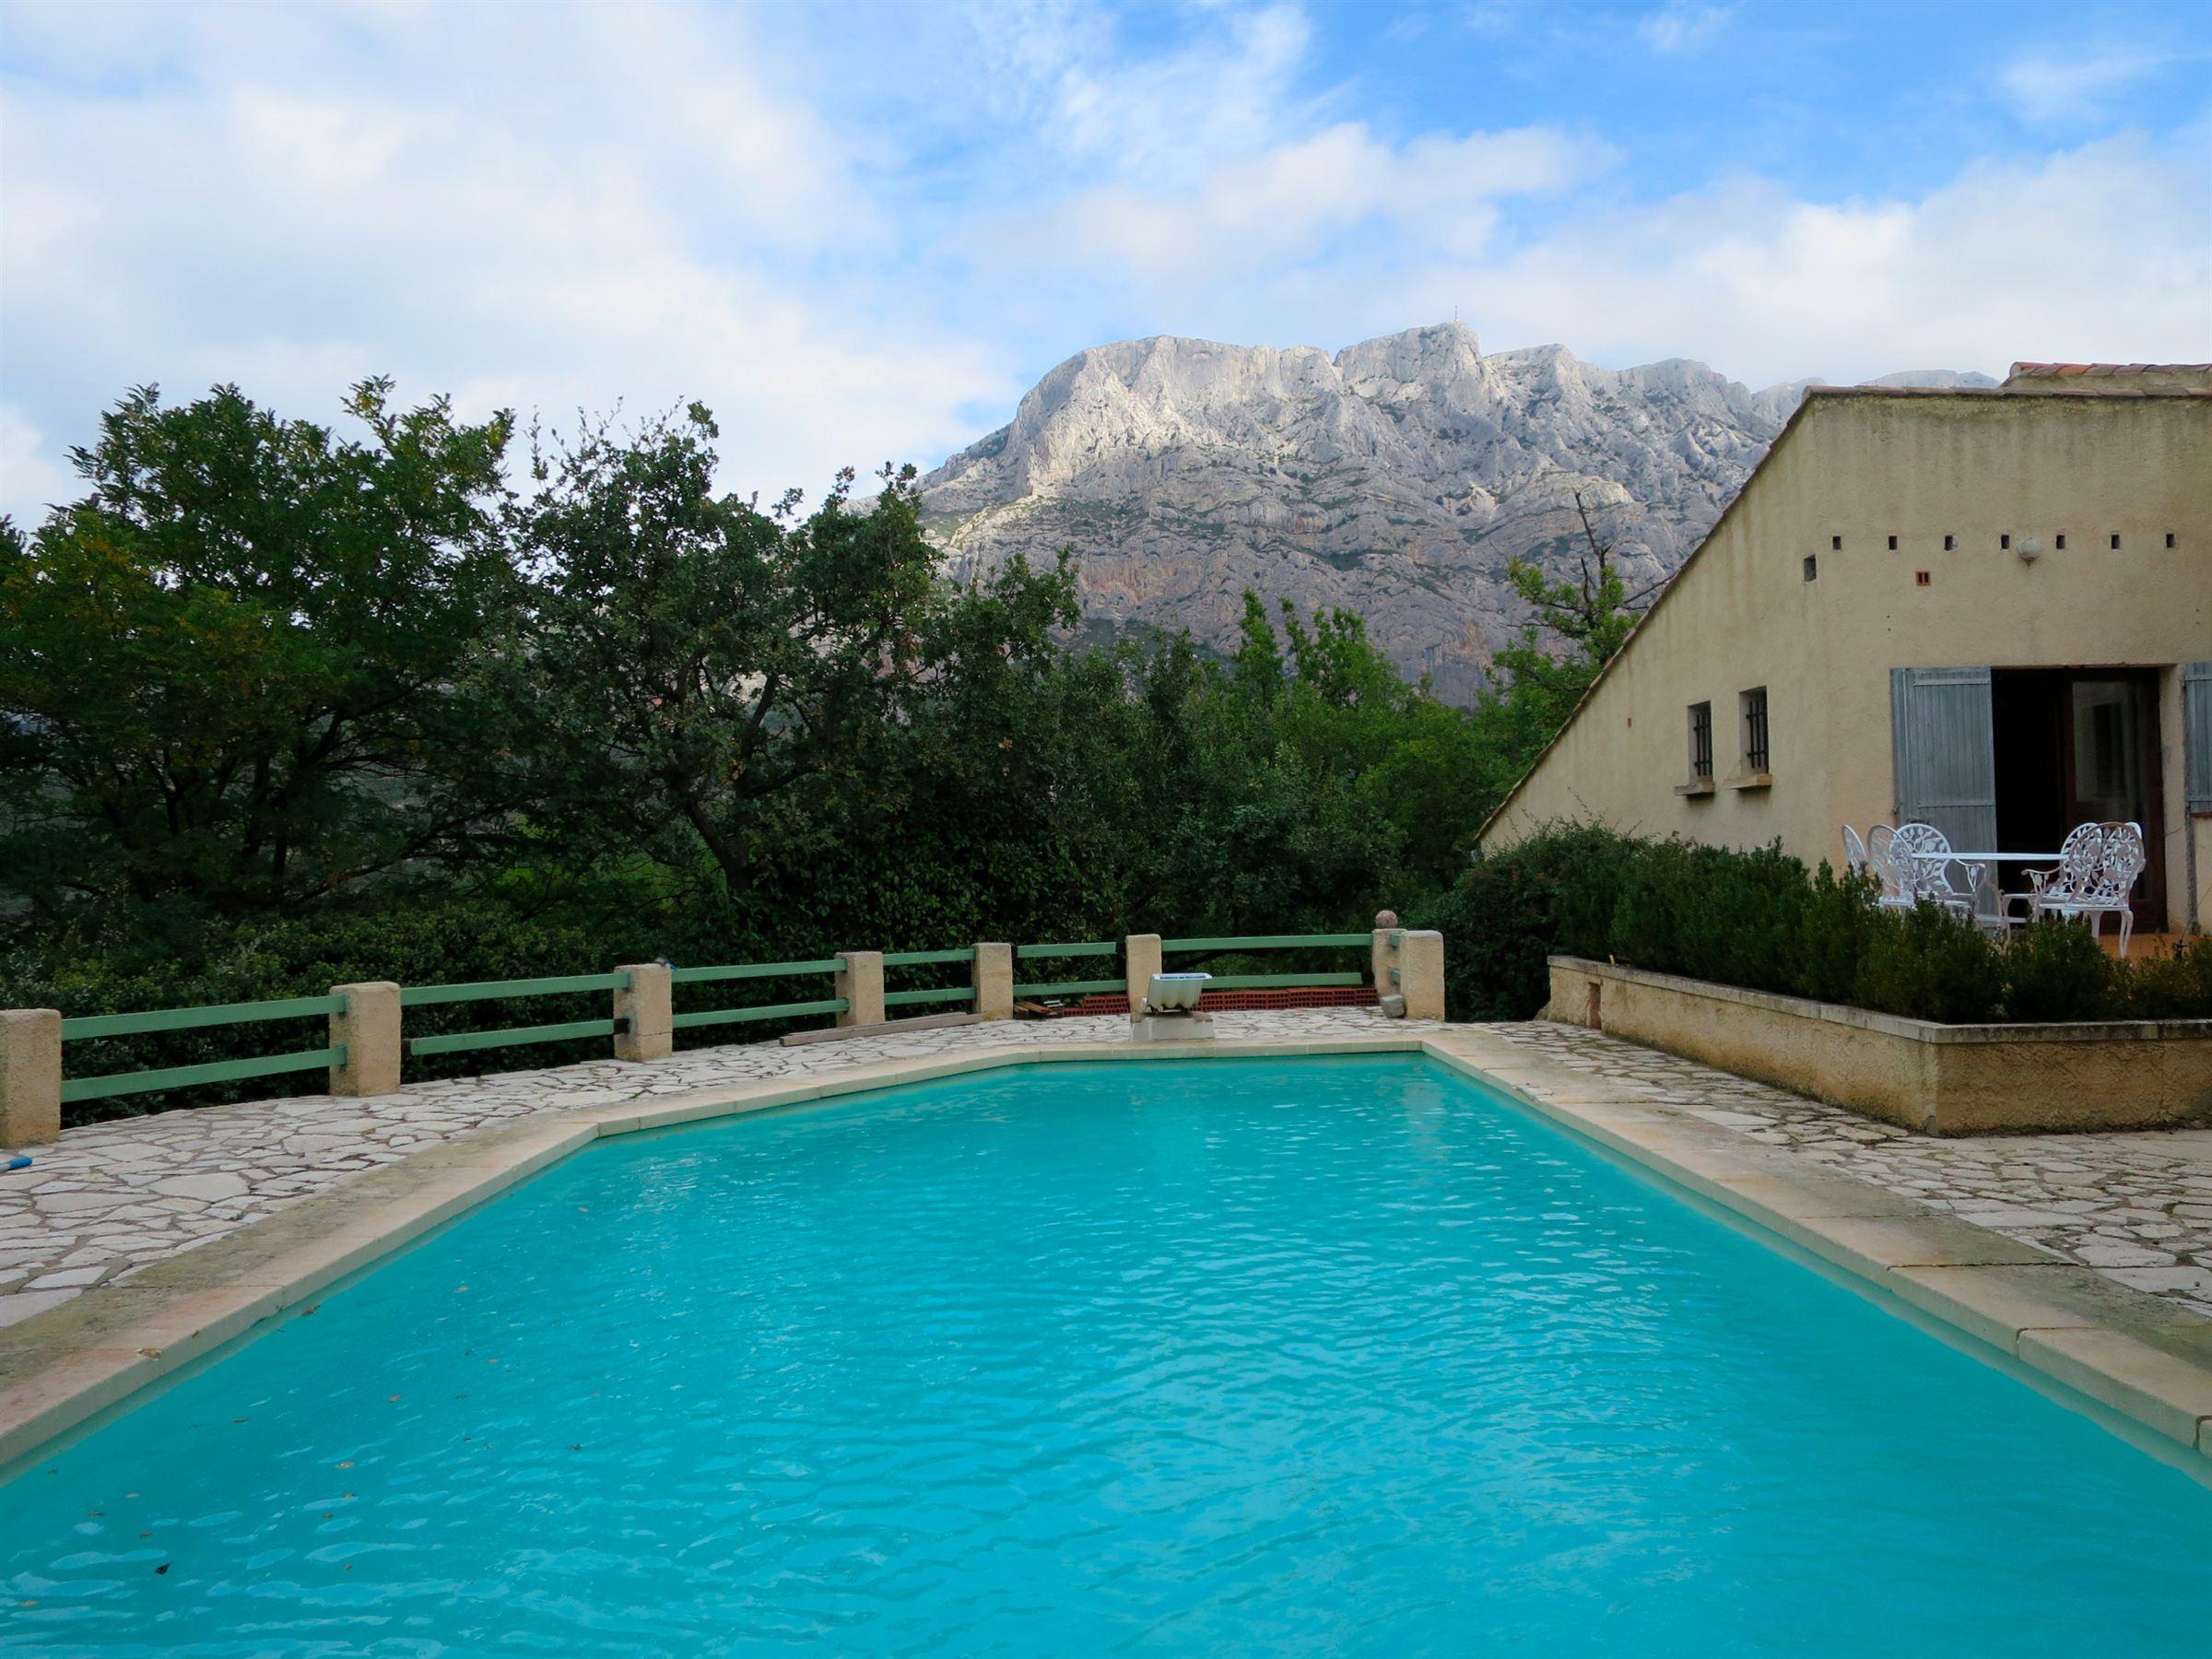 Casa Unifamiliar por un Venta en SAINTE VICTOIRE VIEW Other Provence-Alpes-Cote D'Azur, Provincia - Alpes - Costa Azul, 13100 Francia